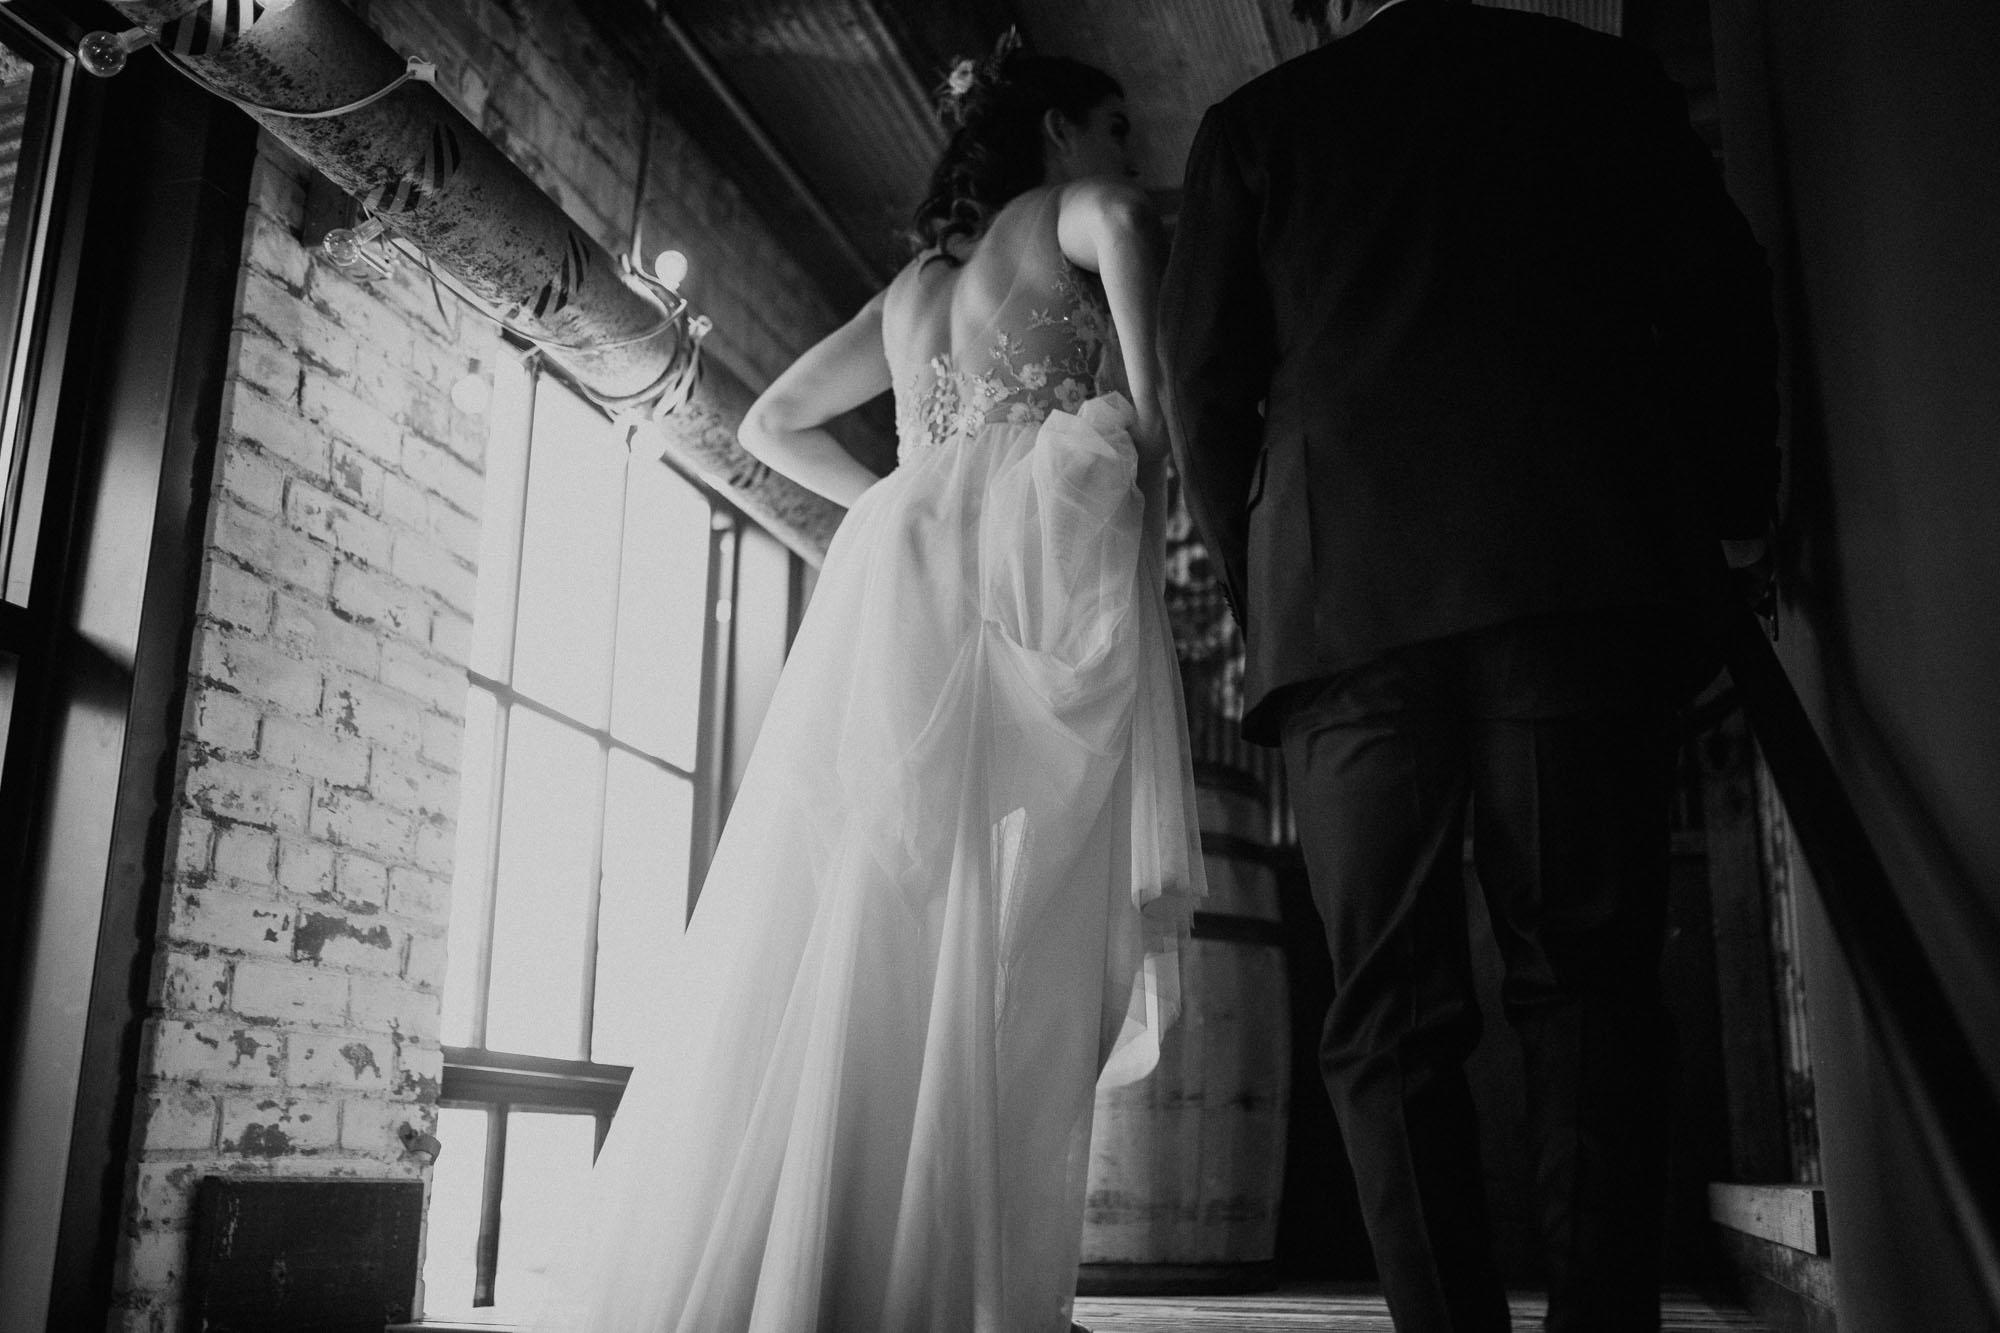 journeyman_distillery_wedding_photographer_chicago_il_wright_photographs-4752.jpg